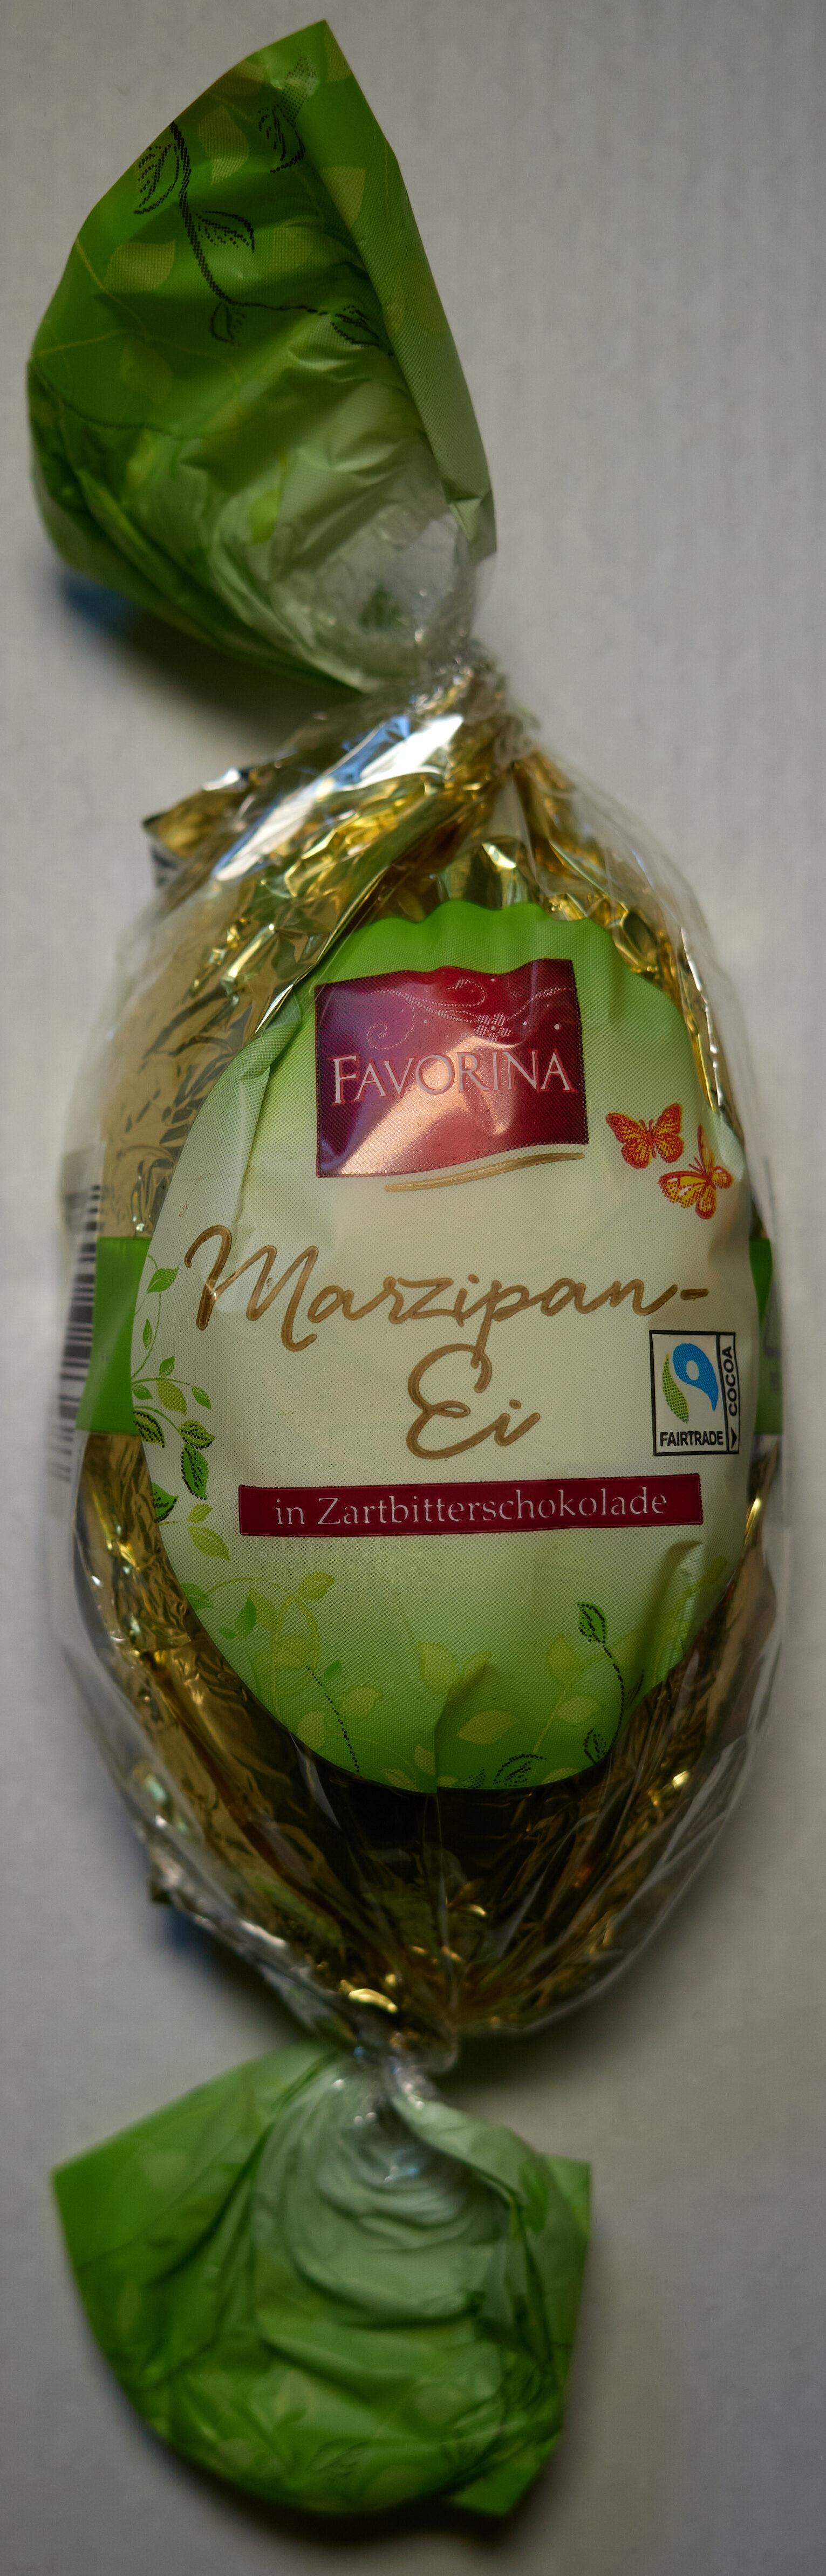 Marzipan-Ei - Product - en